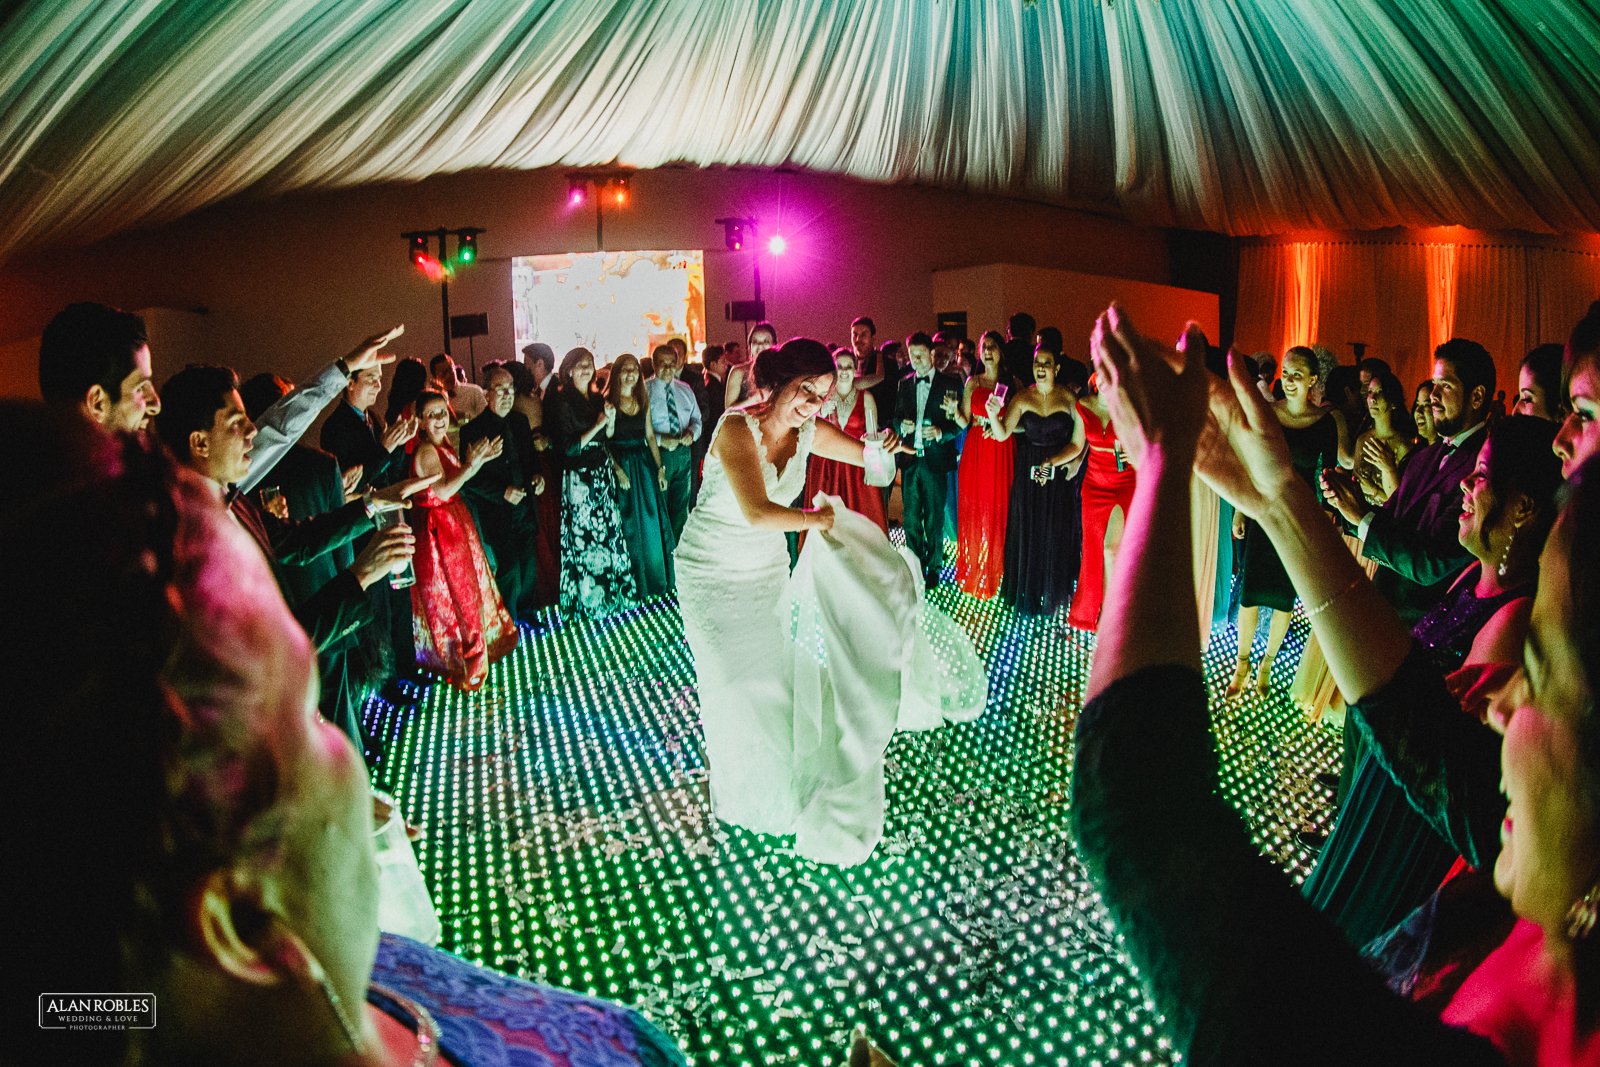 Fotografo de bodas Alan Robles-Boda en Guadalajara Real San Javier-62